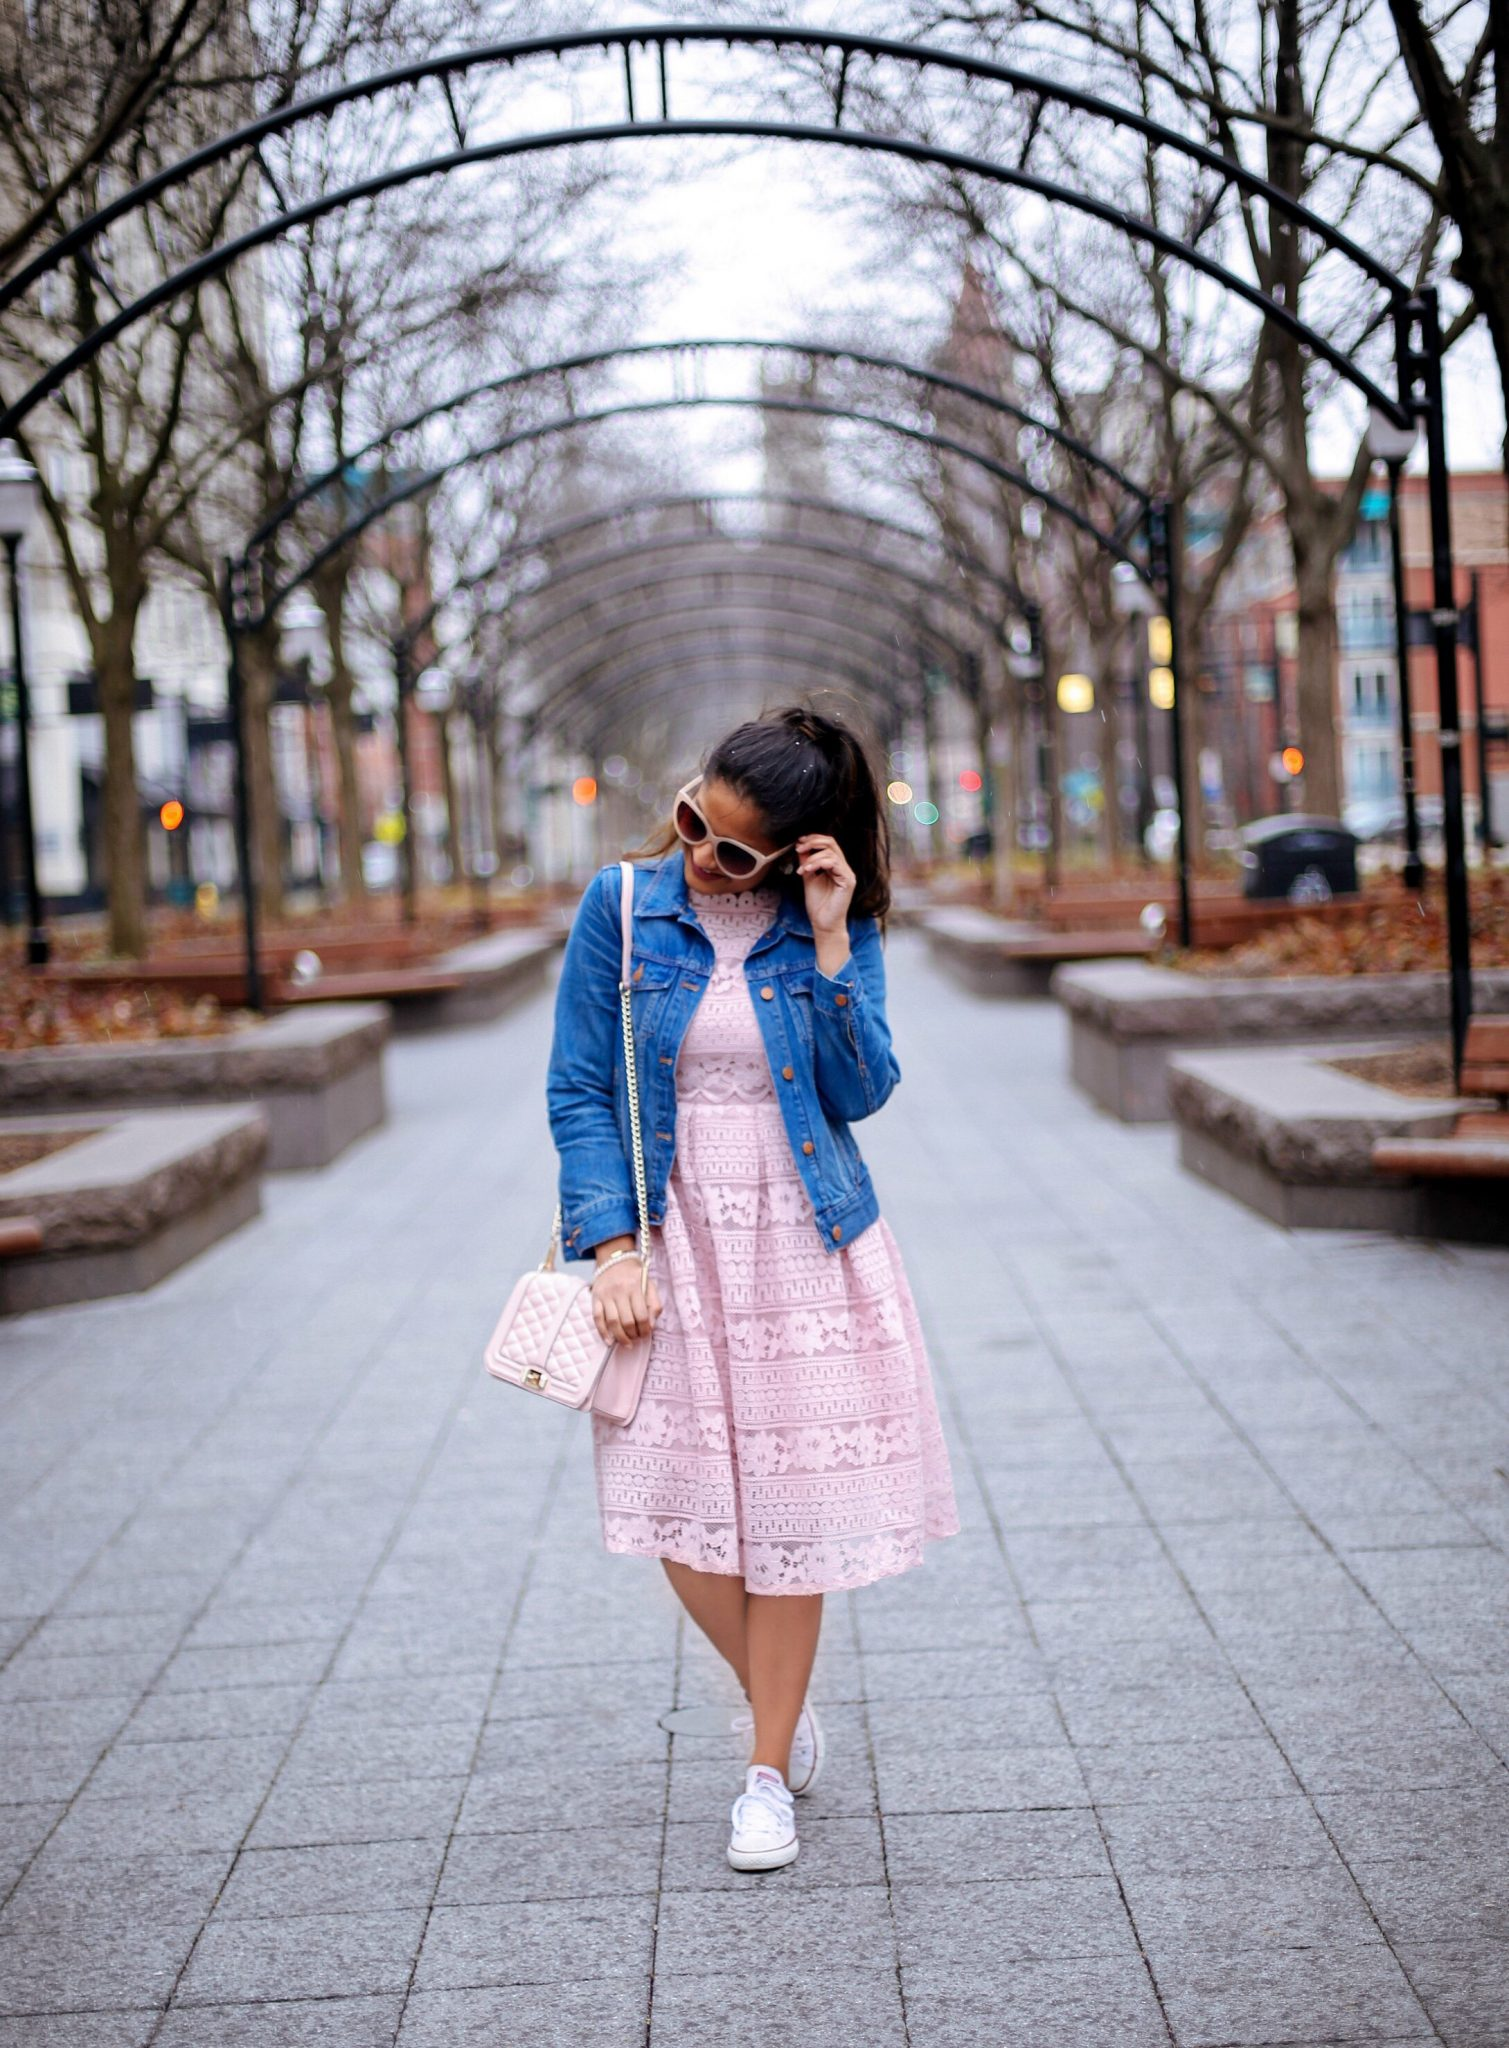 lifestyle blog dreaming loud wearing sammy dress Crochet Openwork Lace High Waist Flare Dress